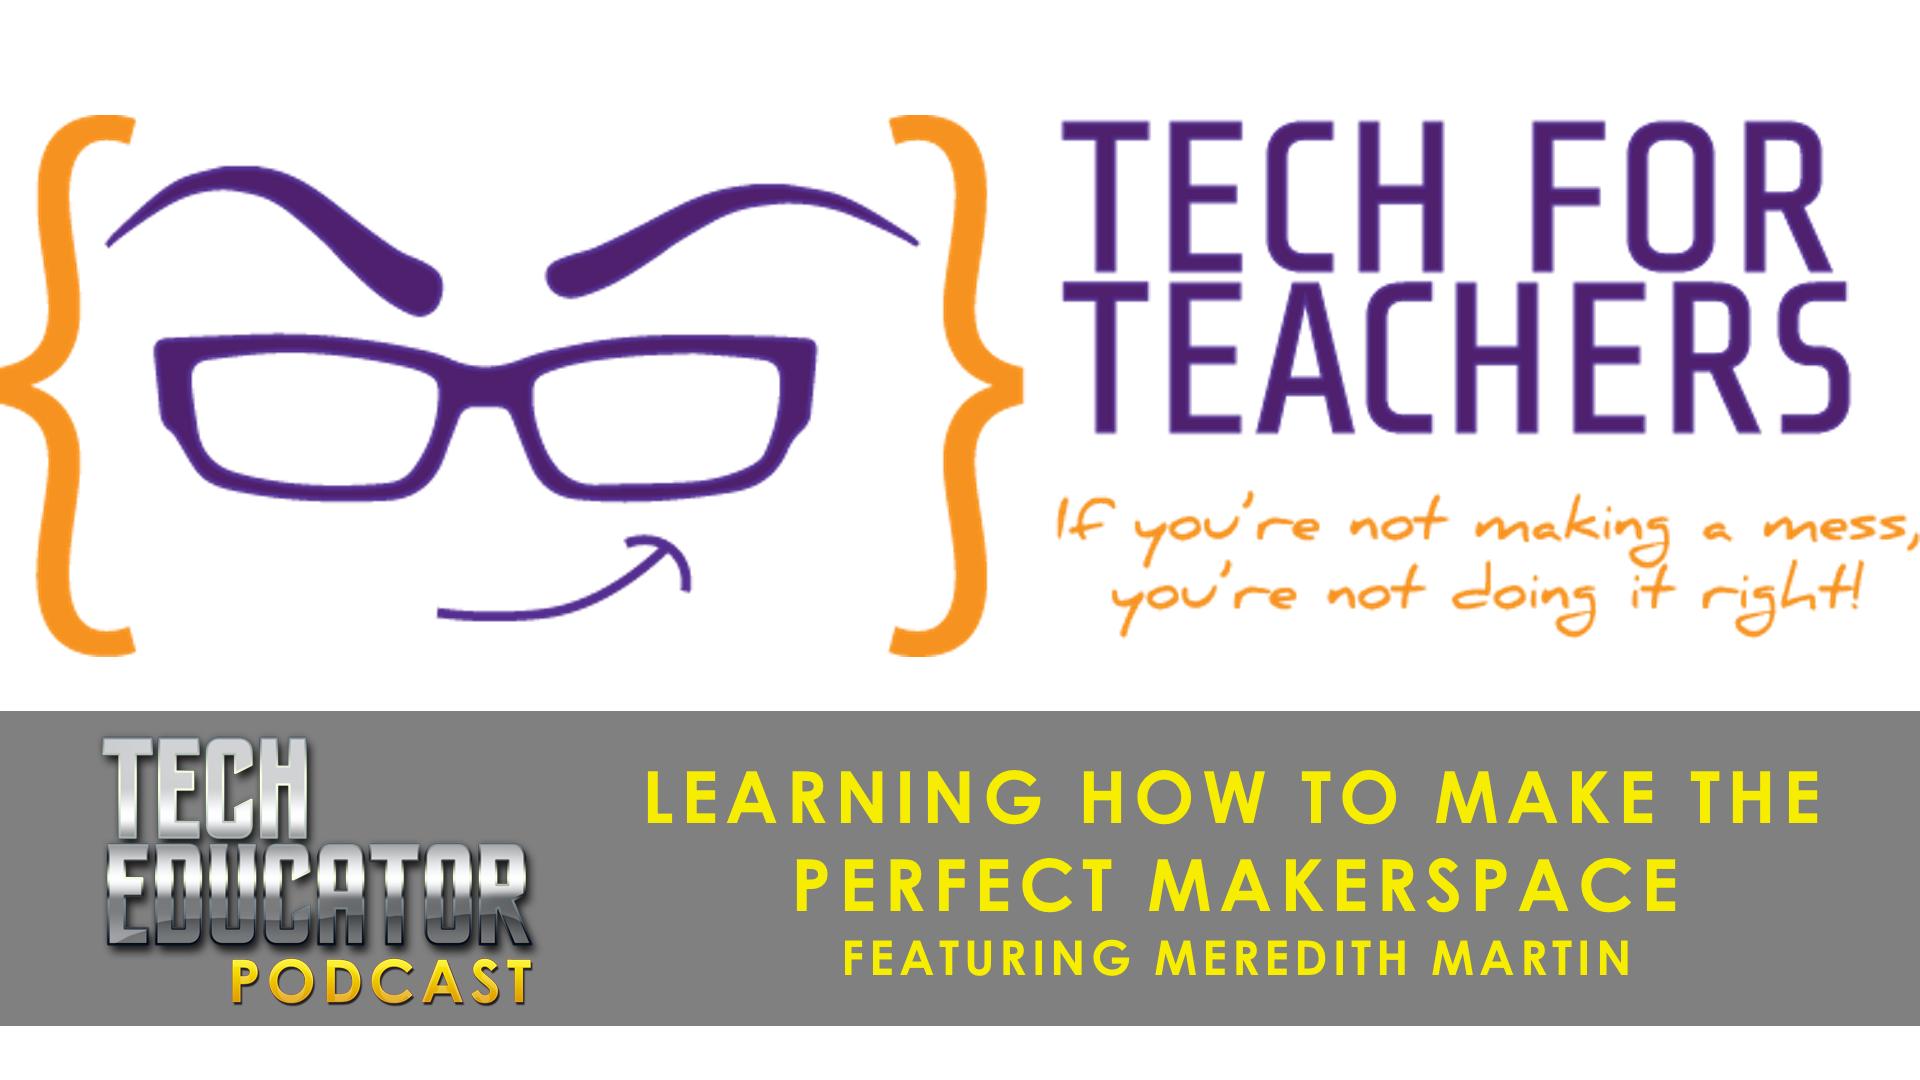 TeacherCast Educational EdTech Podcasts, Blogs, App Reviews, and Online Courses. Created by Jeff Bradbury @TeacherCast